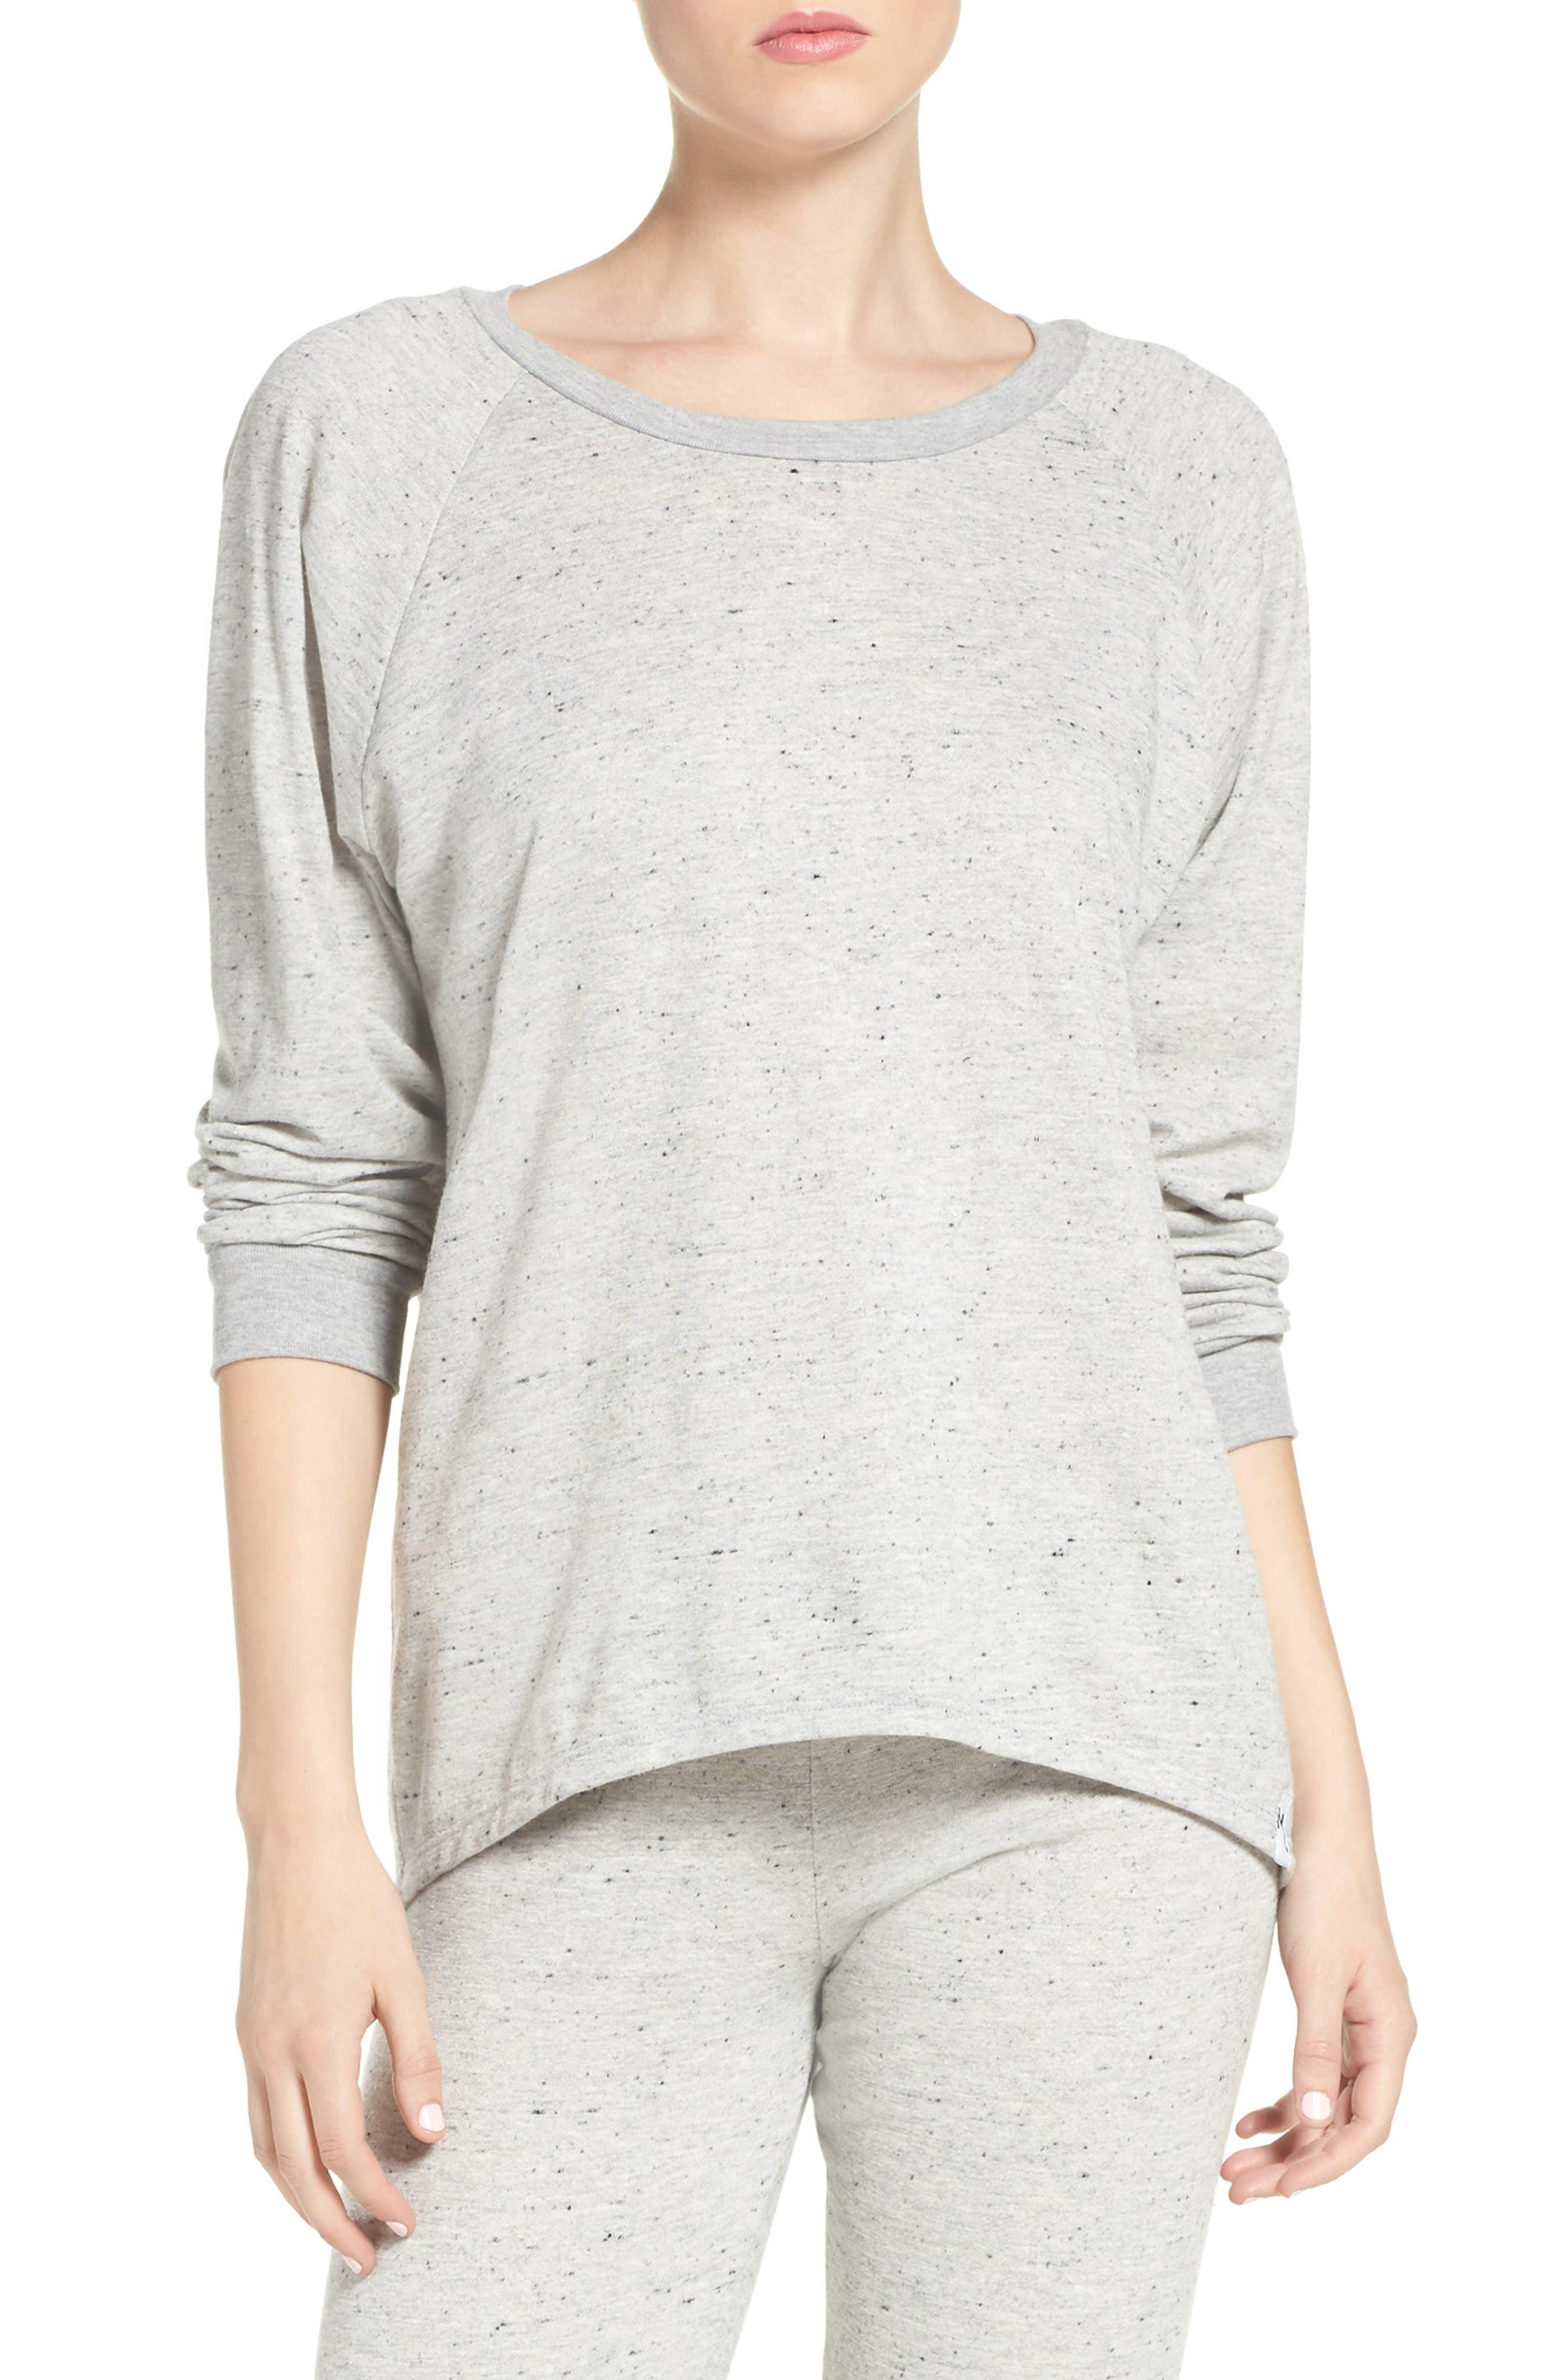 Zuma Lounge Sweatshirt,                         Main,                         color, 020